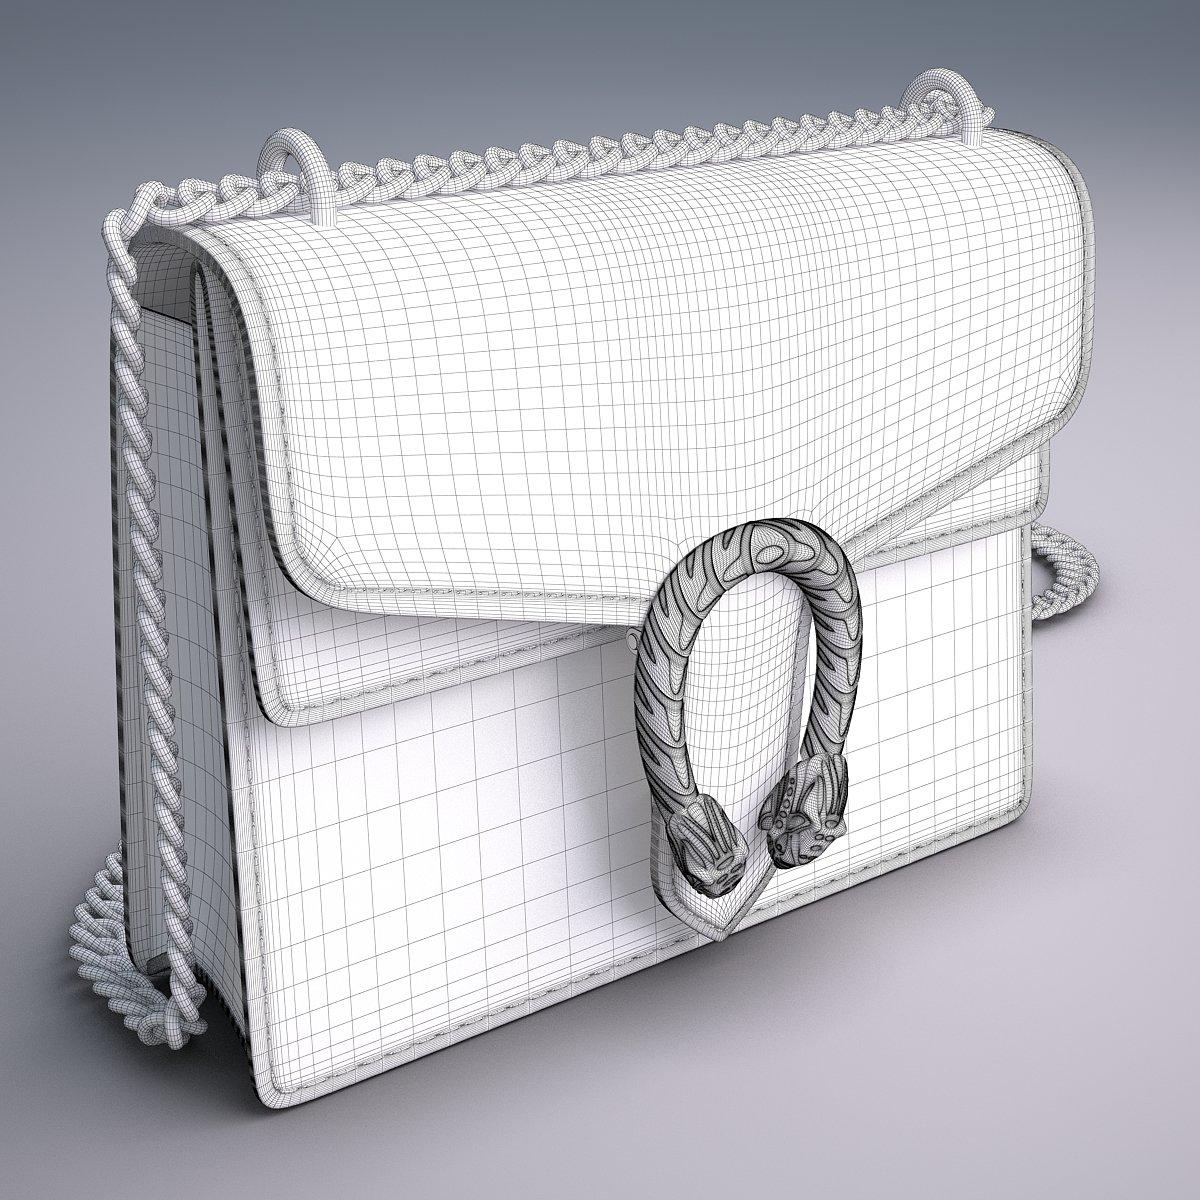 6cd314346d9 Gucci Dionysus GG Supreme mini bag 3D Model in Clothing 3DExport